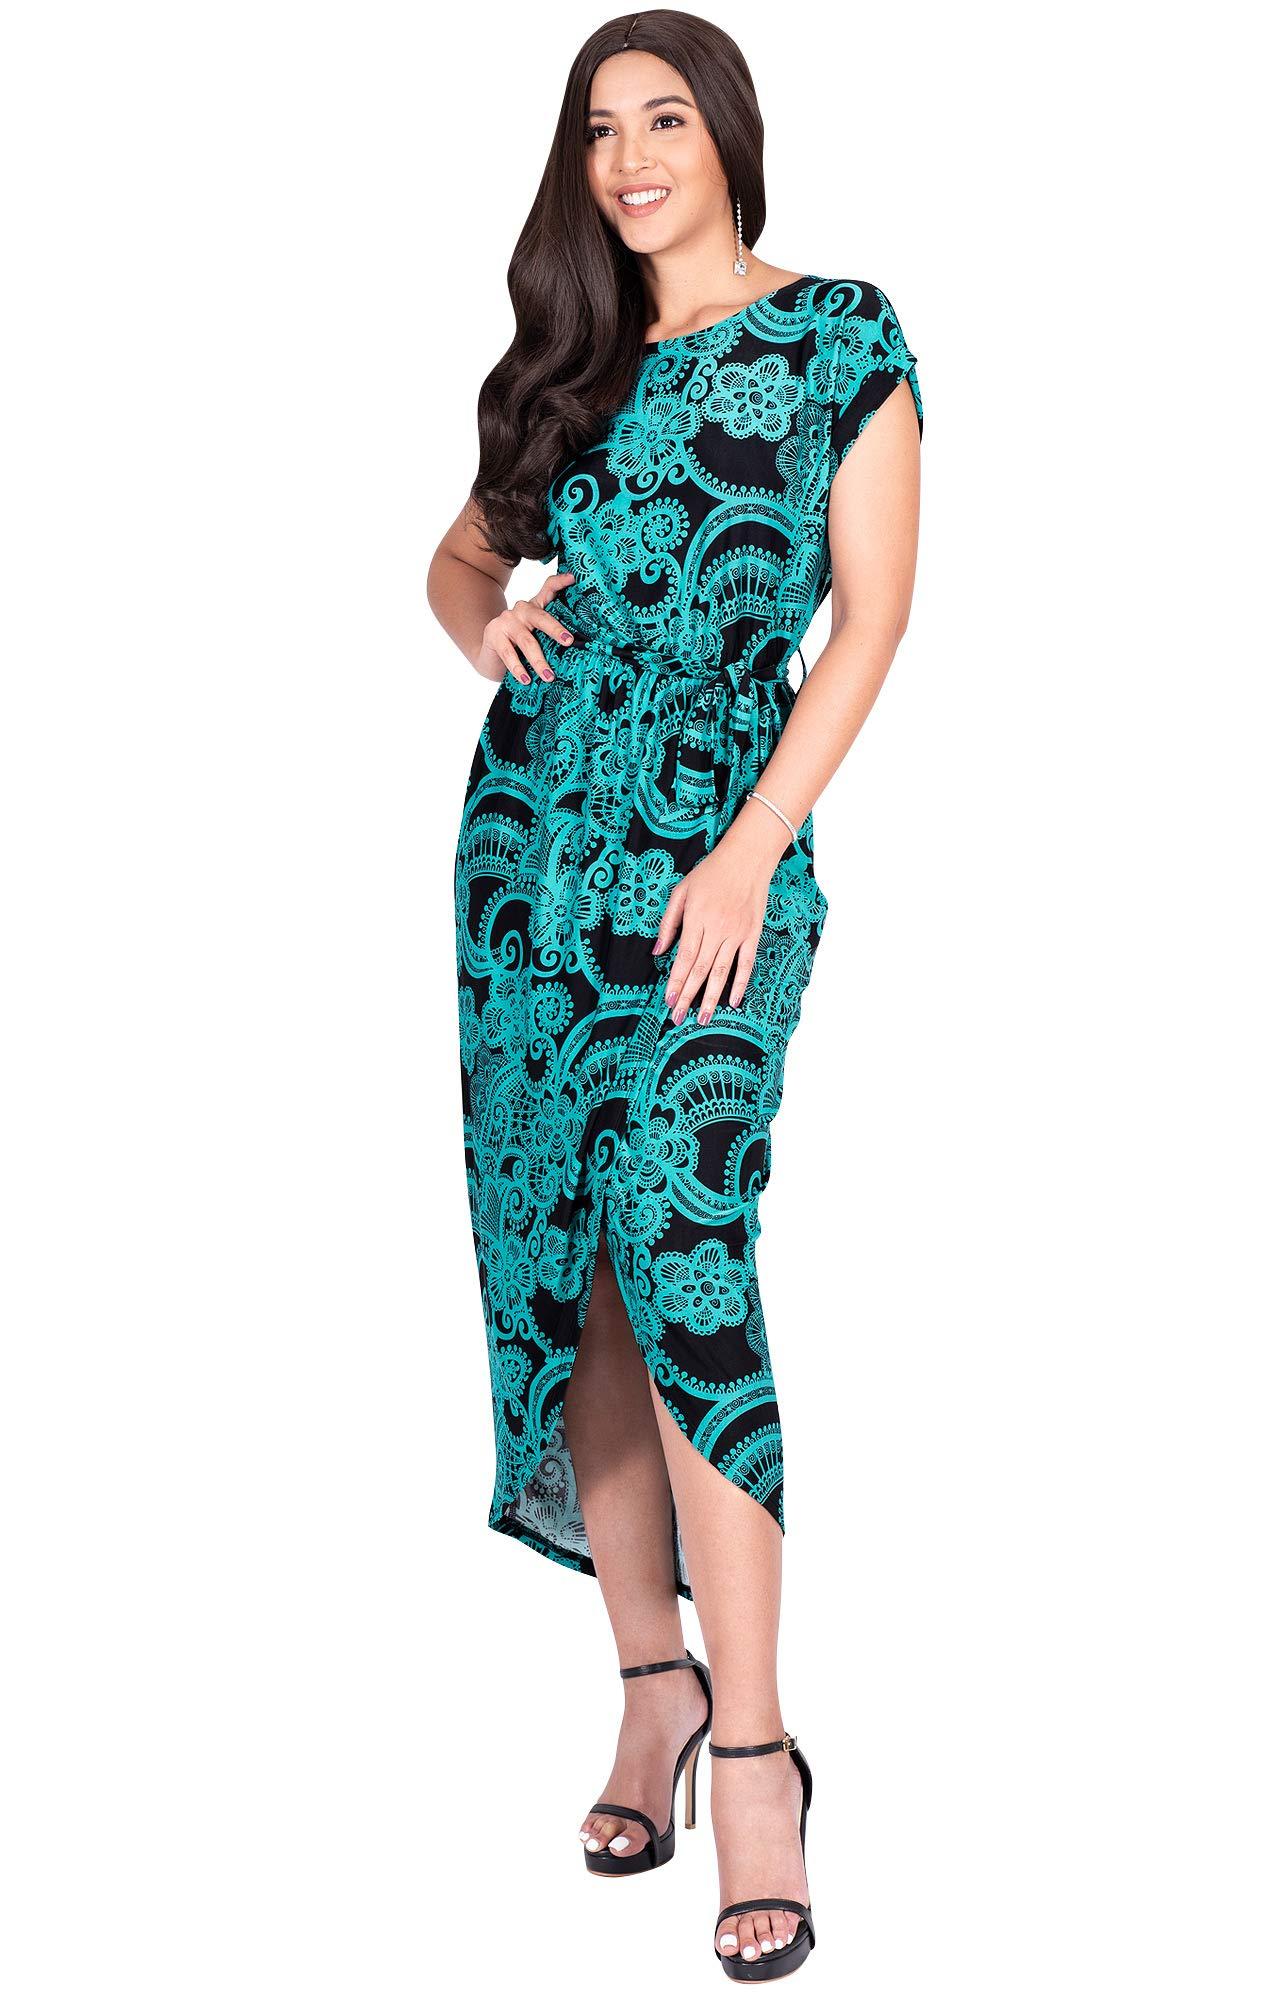 Available at Amazon: KOH KOH Women's Long Floral Print Casual Asymmetrical Short Sleeve Midi Dress